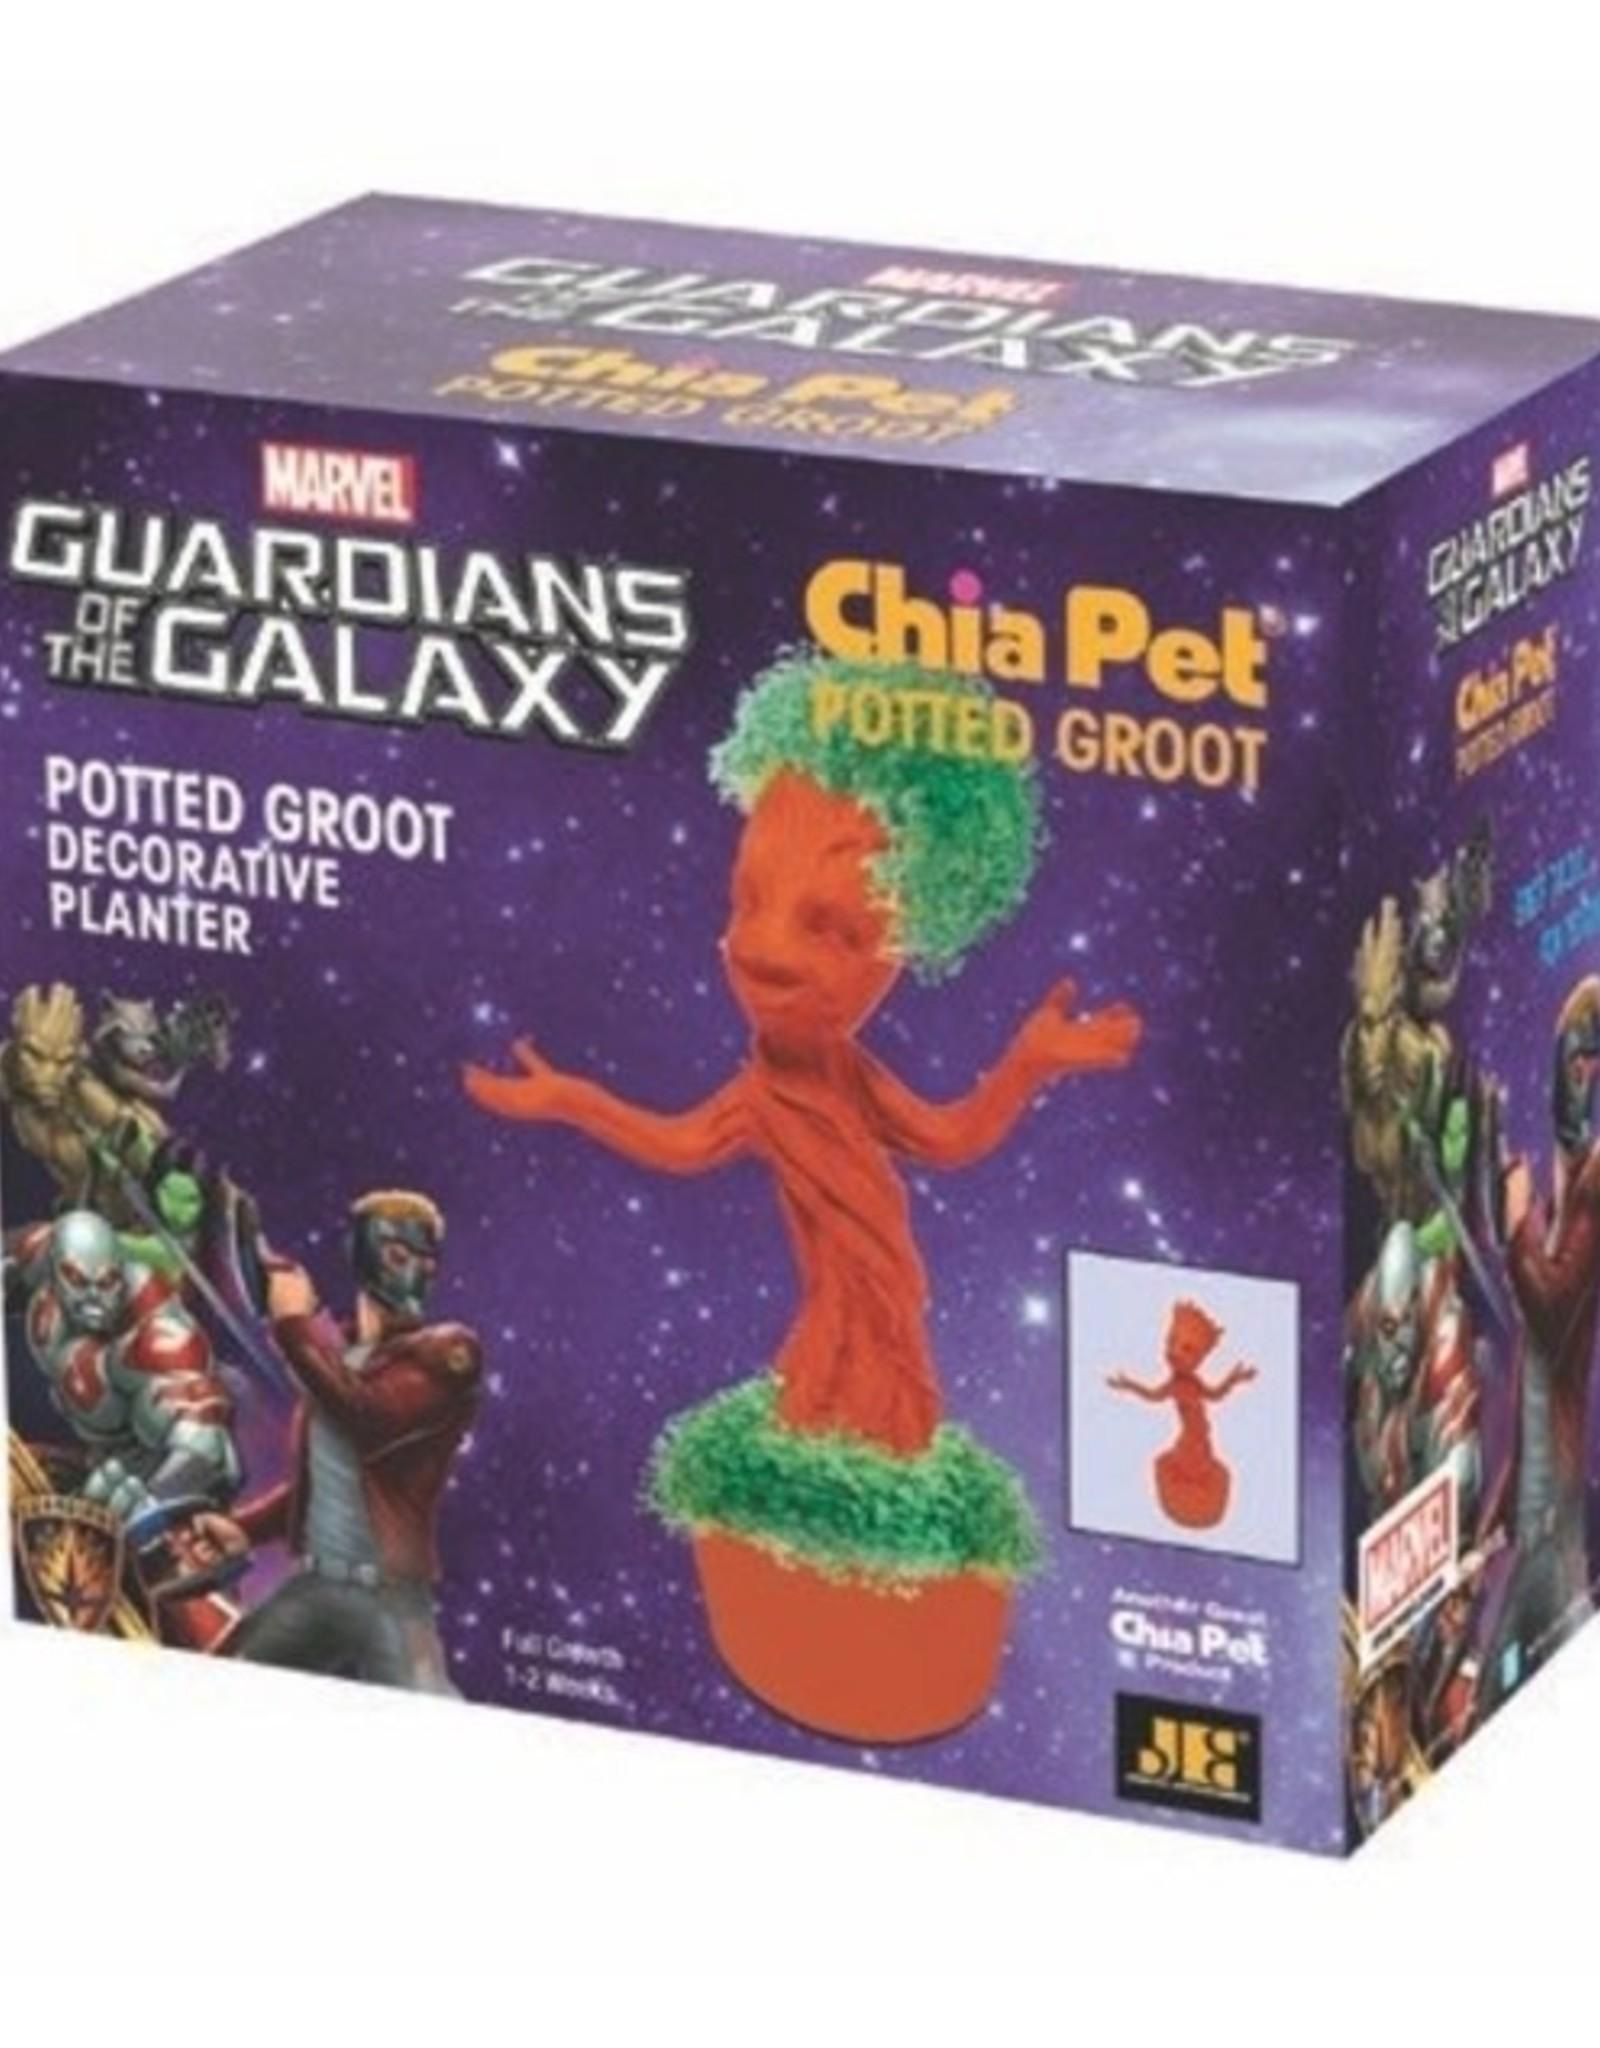 Chia Pet Chia Groot Potted